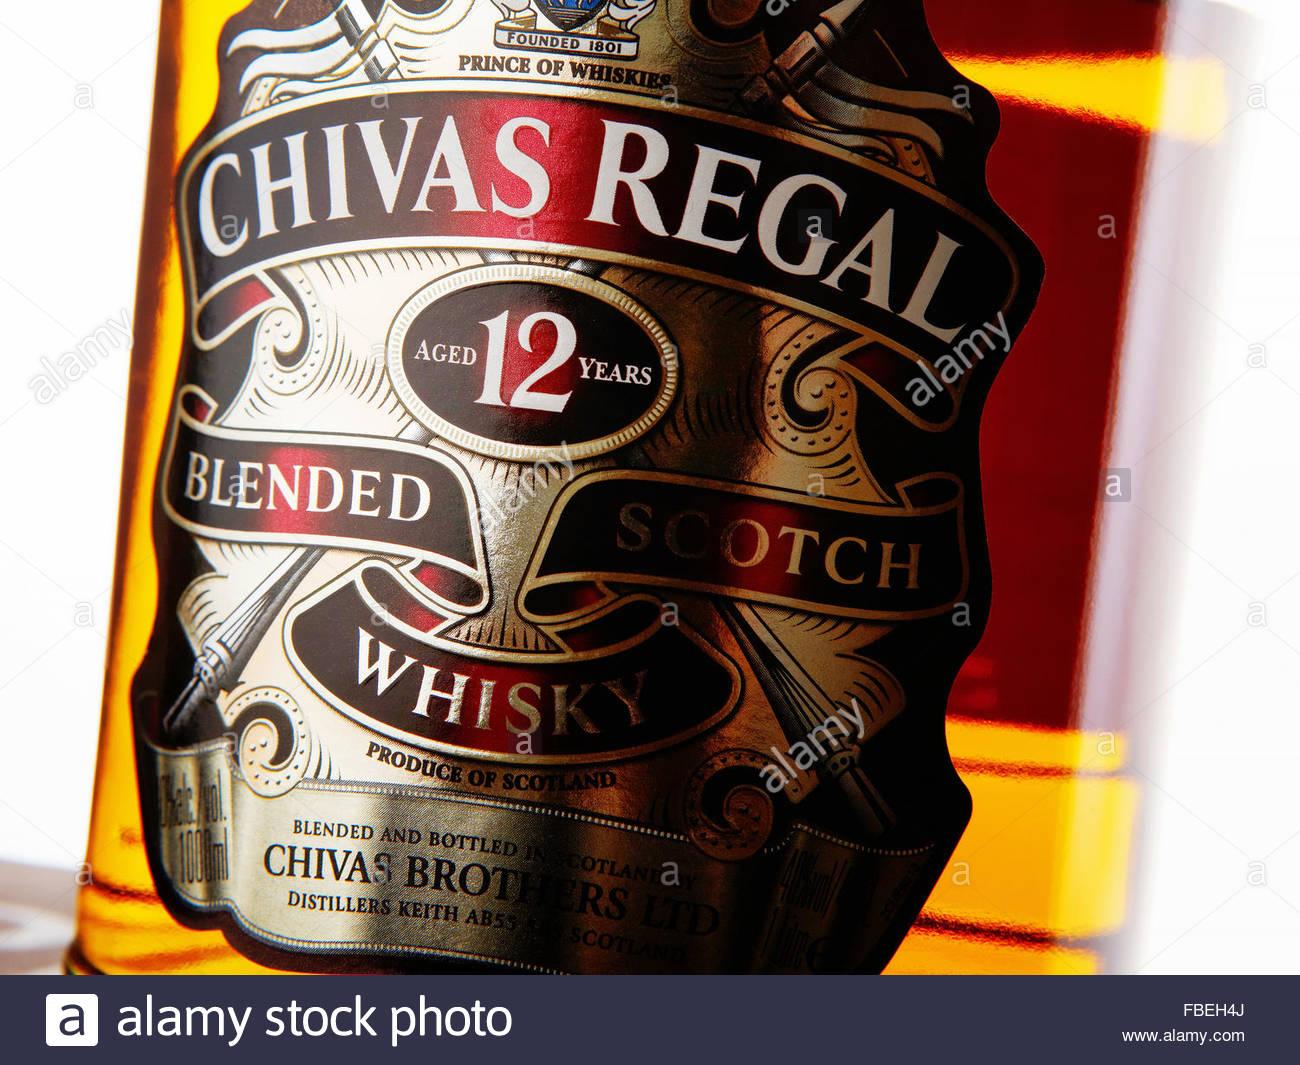 MINSK, BELARUS - FEBRUARY 7, 2010: Chivas Regal whisky bottle close up. Chivas Regal is blended scotch whisky produced - Stock Image